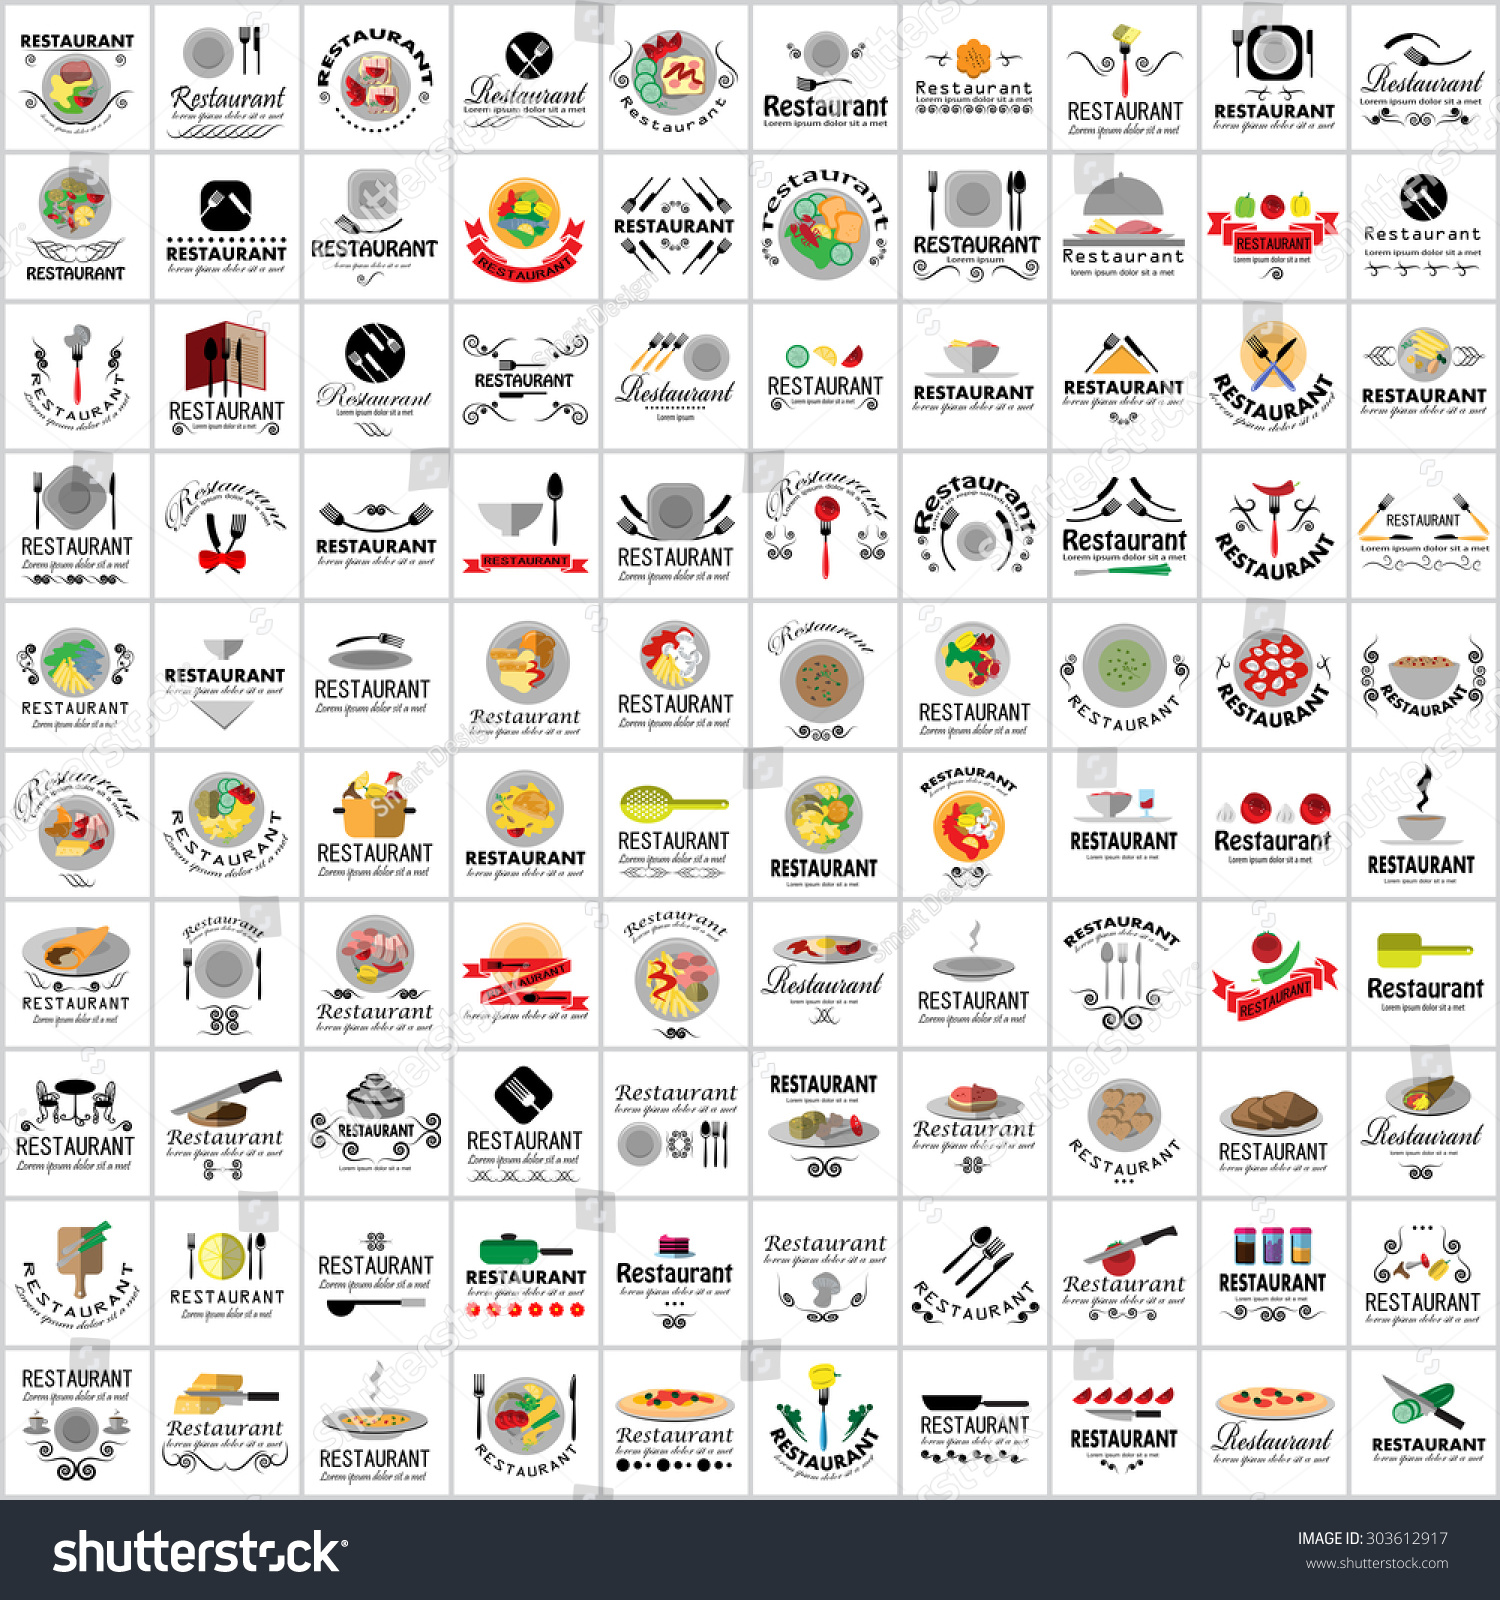 Restaurant flat icons set vector illustration graphic